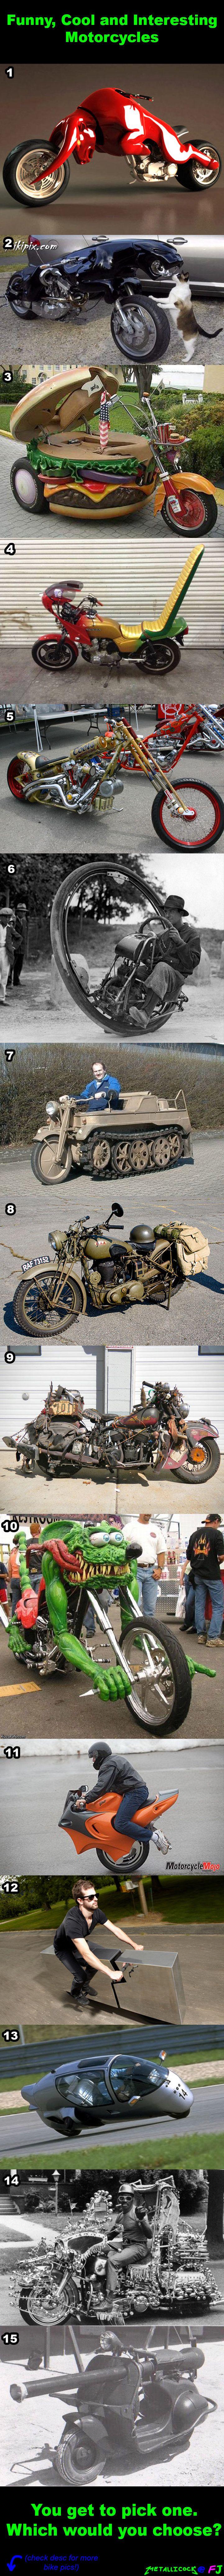 Cool, Funny and Interesting Bike comp.